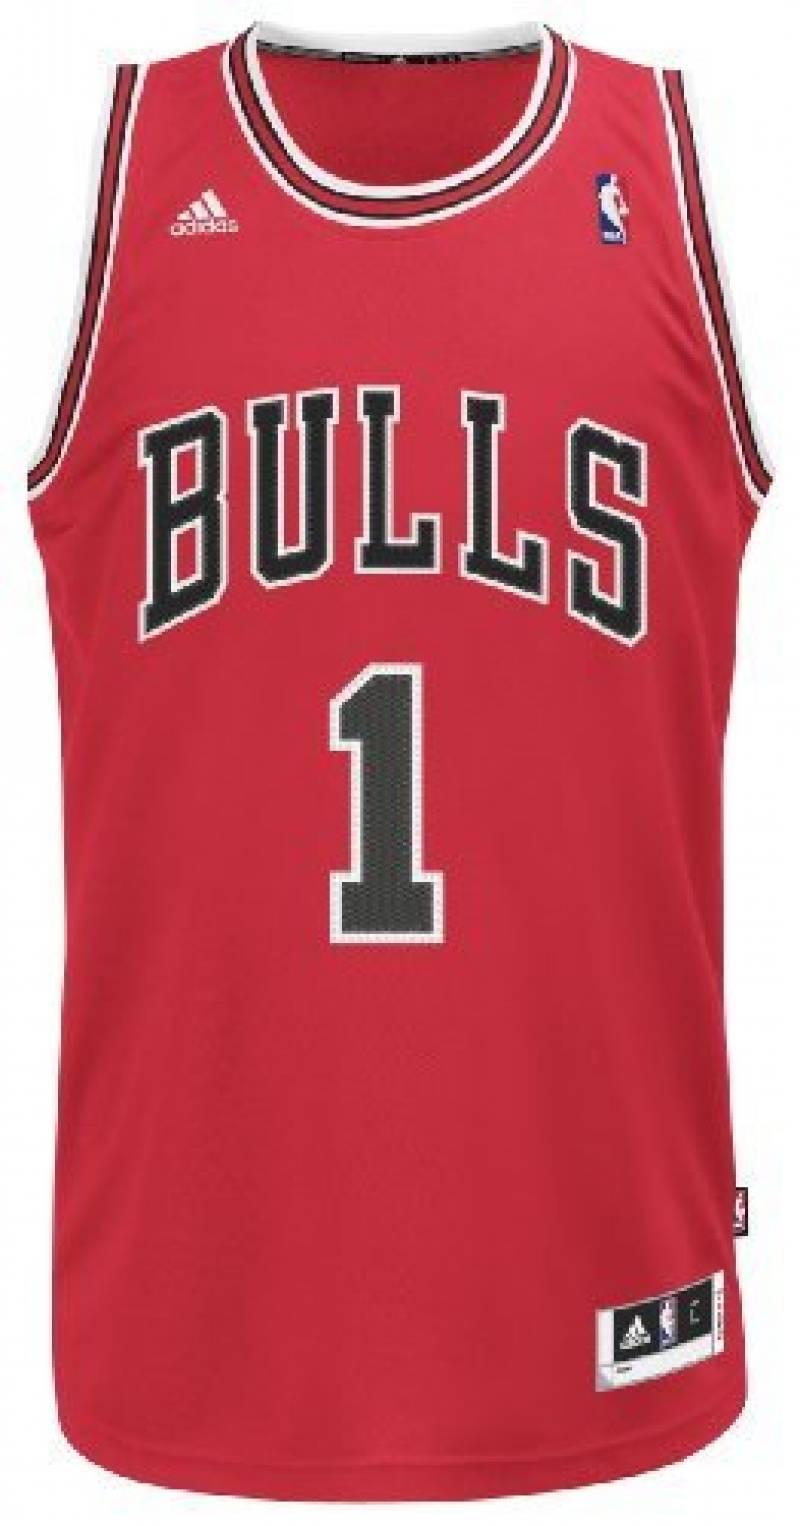 Derrick Rose Chicago Bulls Adidas Revolution 30 Red Swingman Jersey Maillot de la marque adidas TOP 4 image 0 produit